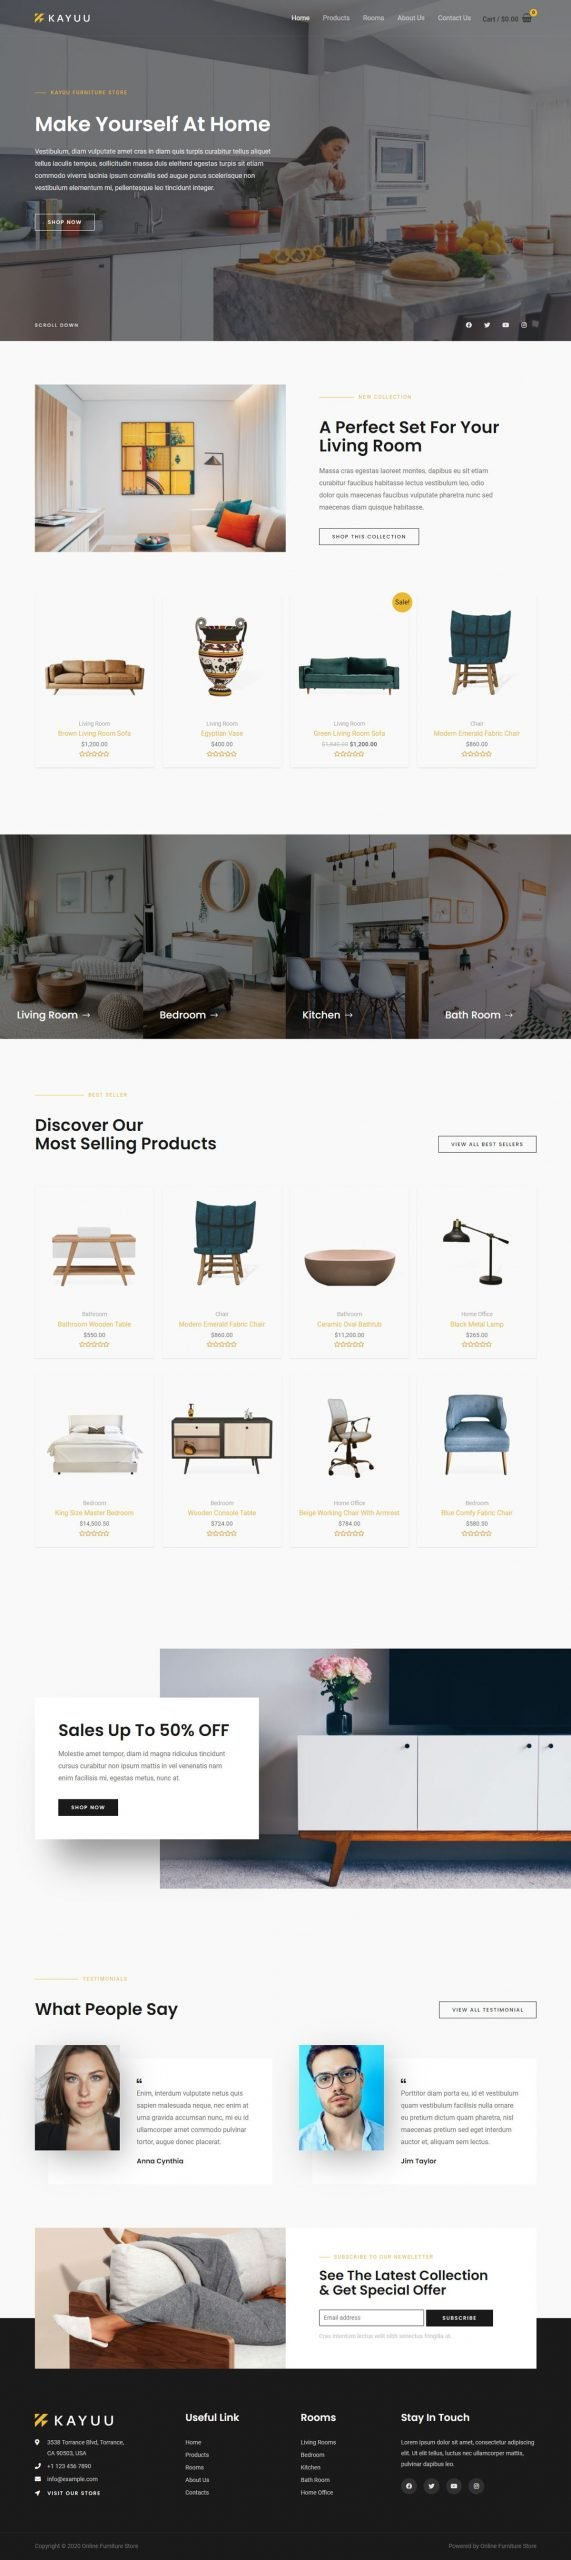 Adamo Web Design | Web Design Durham | home decor 04 scaled